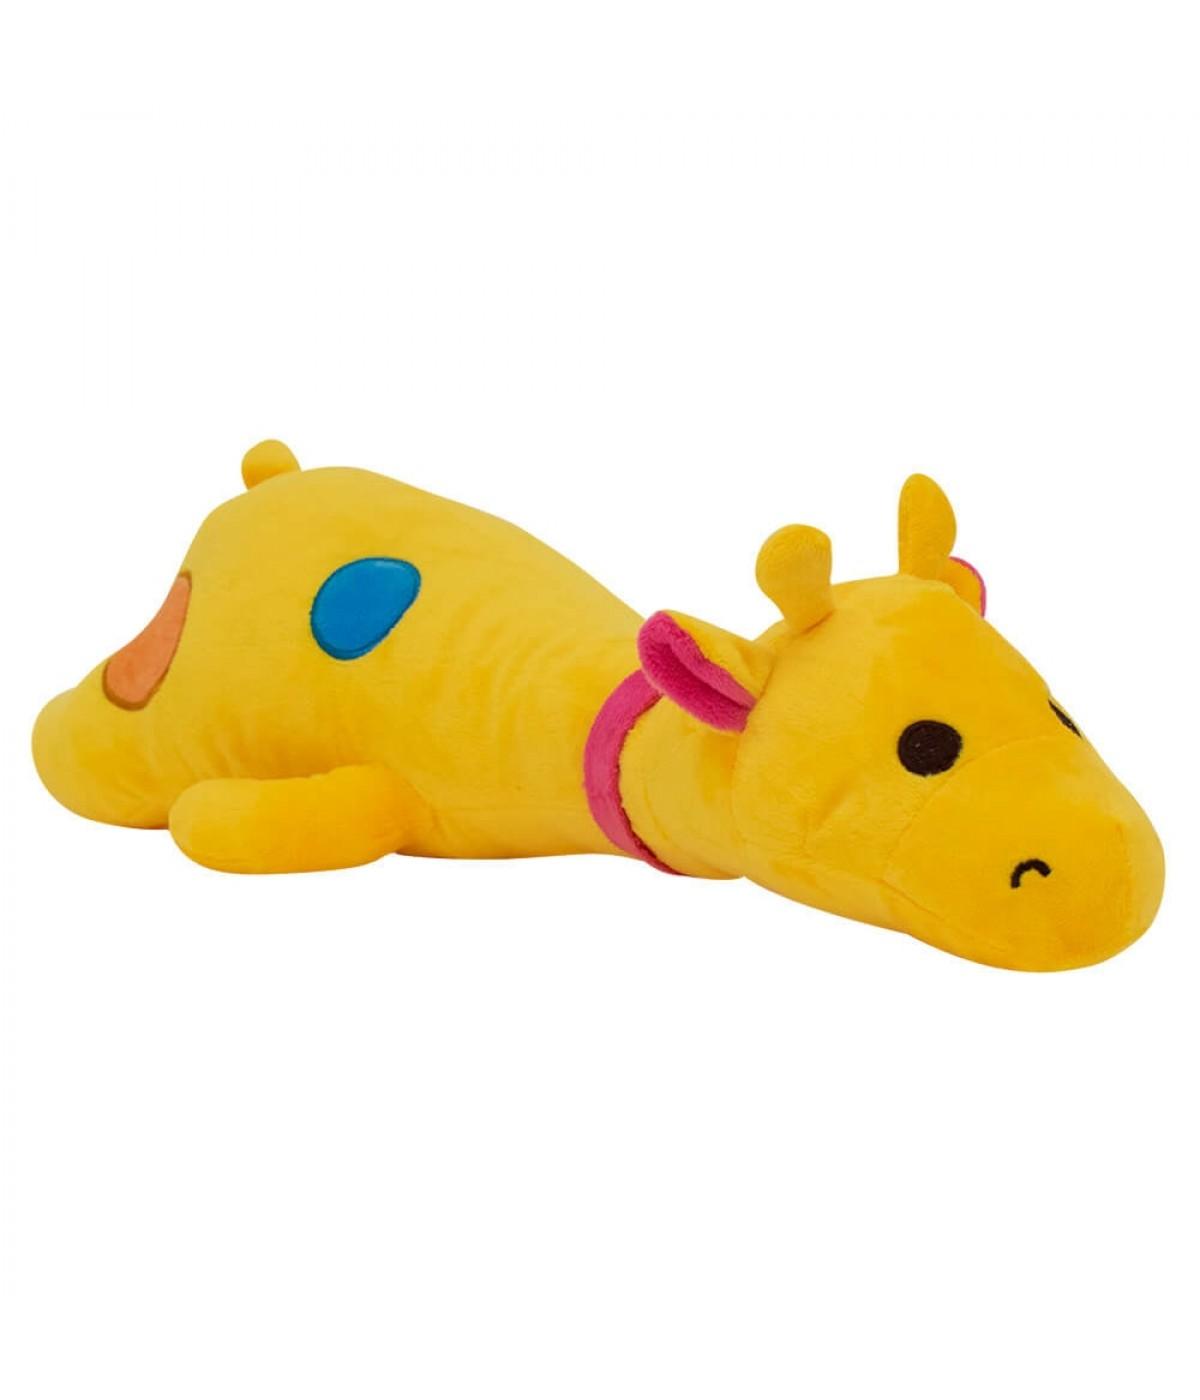 Girafa Deitado Amarelo 50cm - Pelúcia